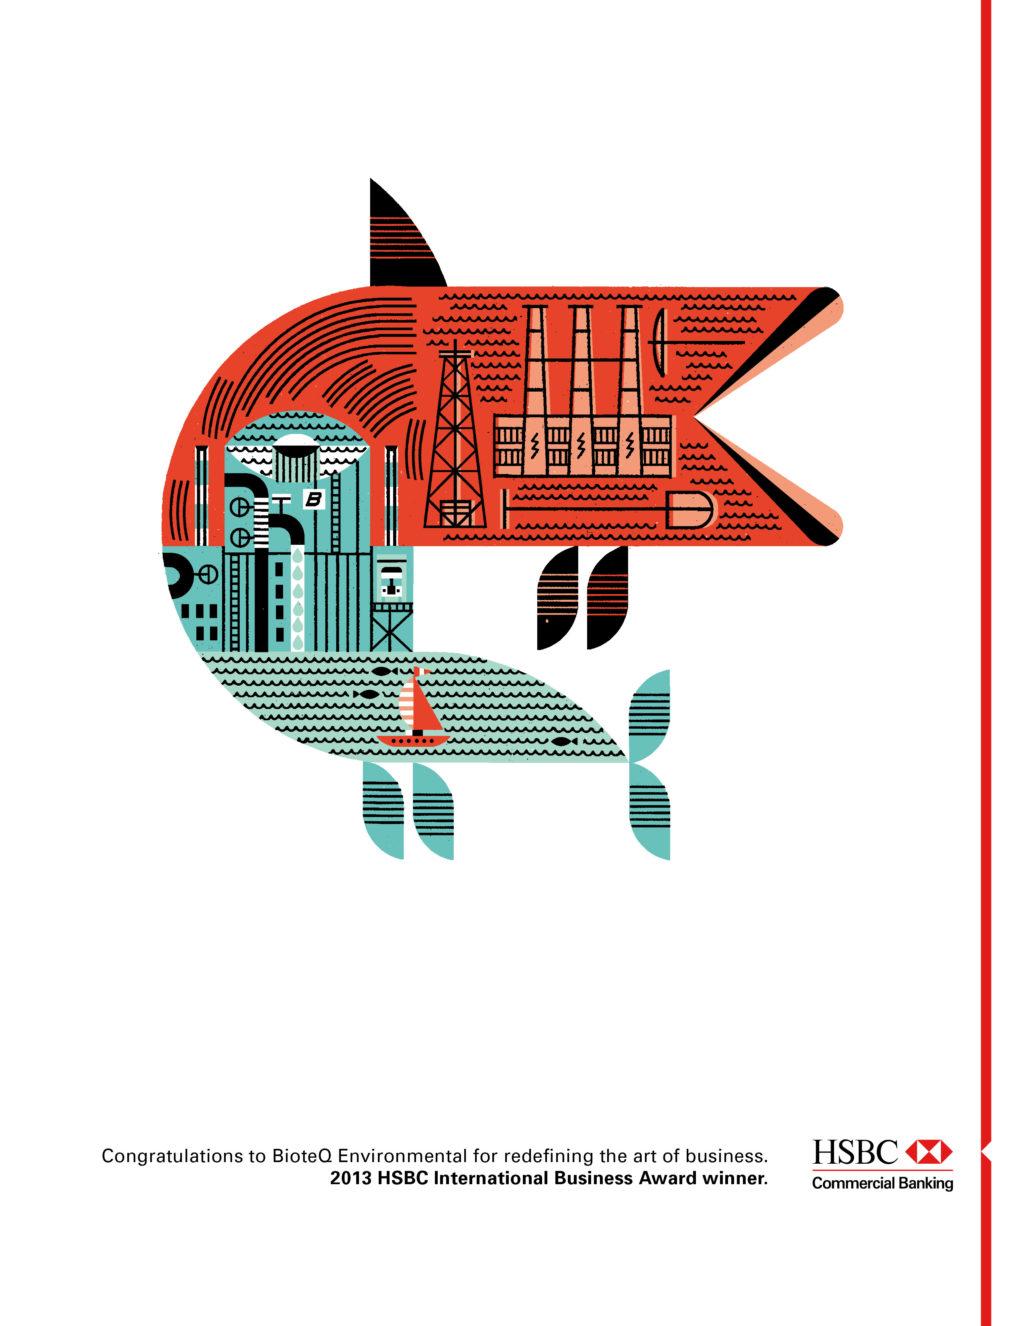 HSBC Business Awards illustrated Design Advertising